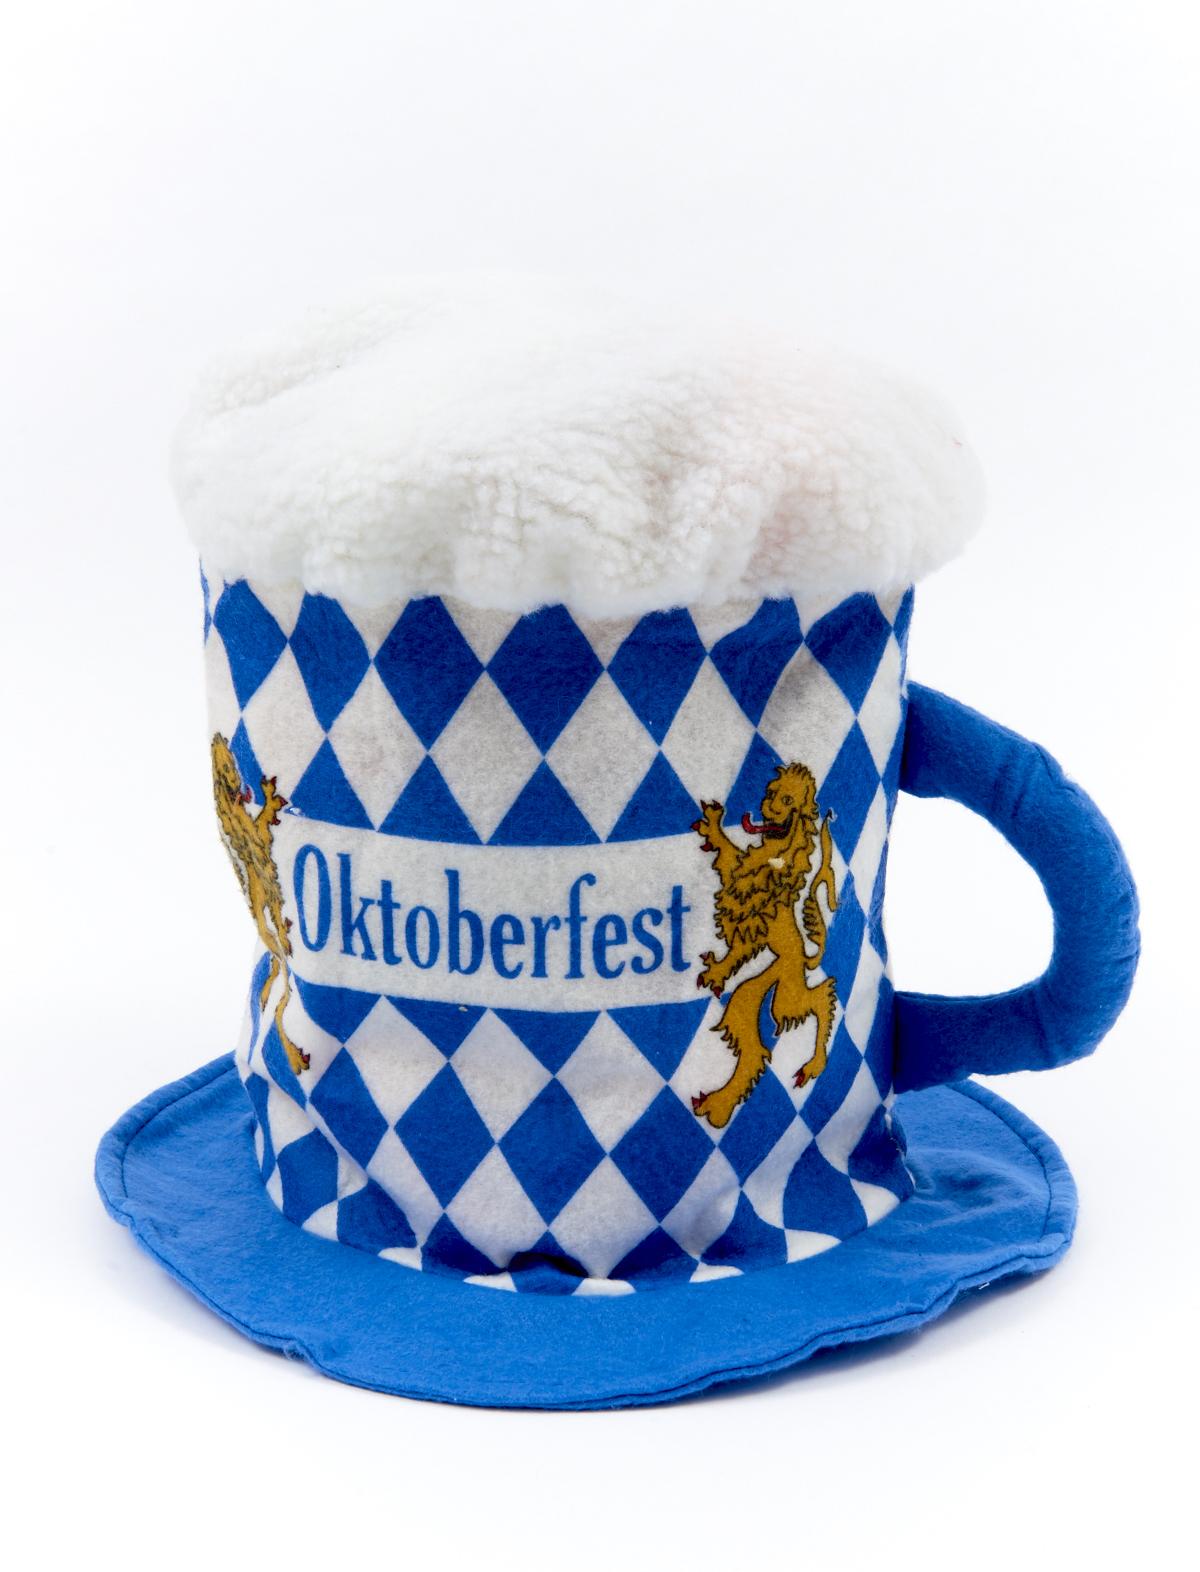 Bayernhut Oktoberfest Bierkrug